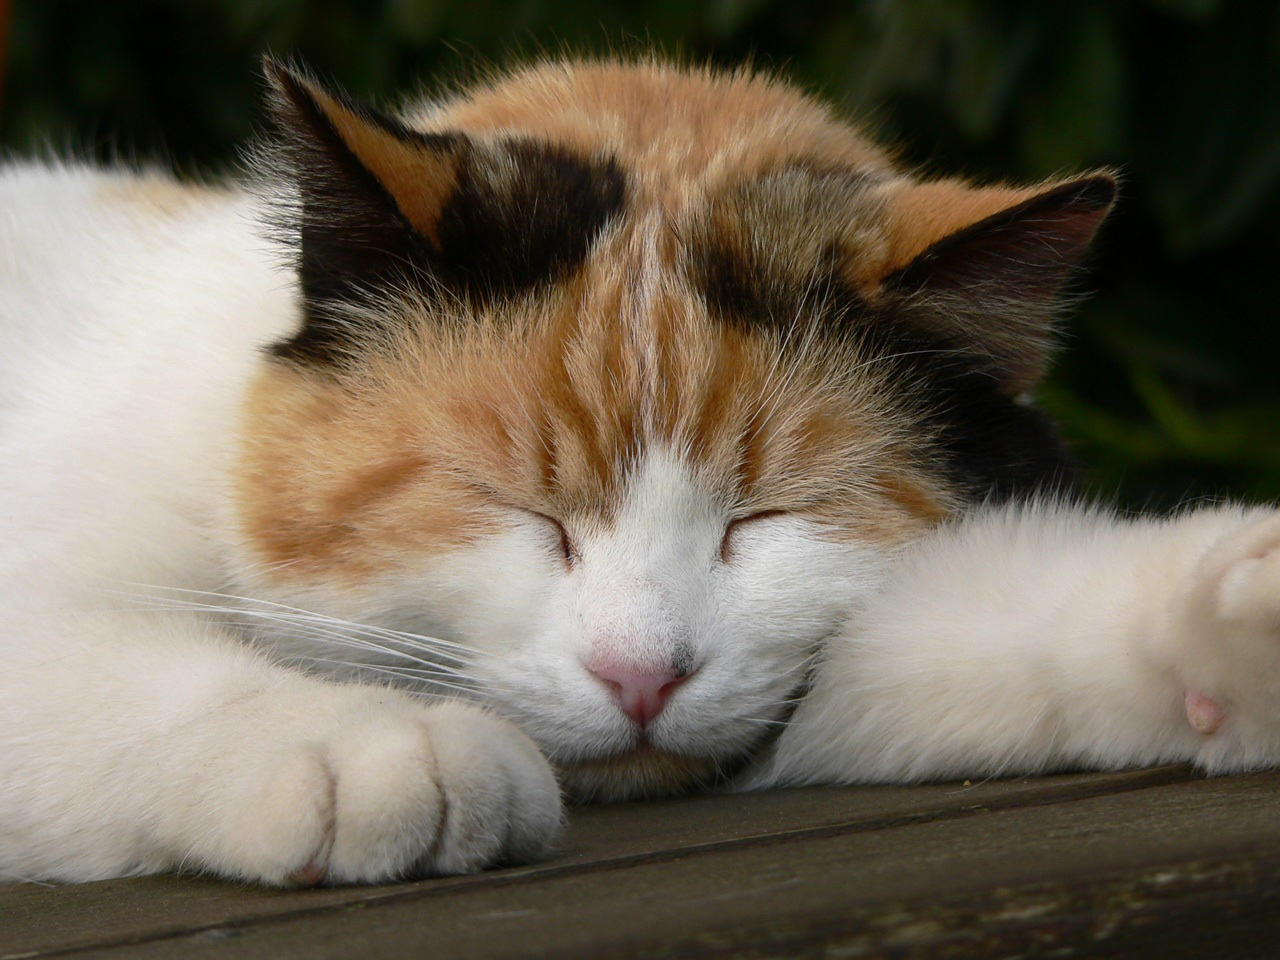 tobramycin eye drops for cats